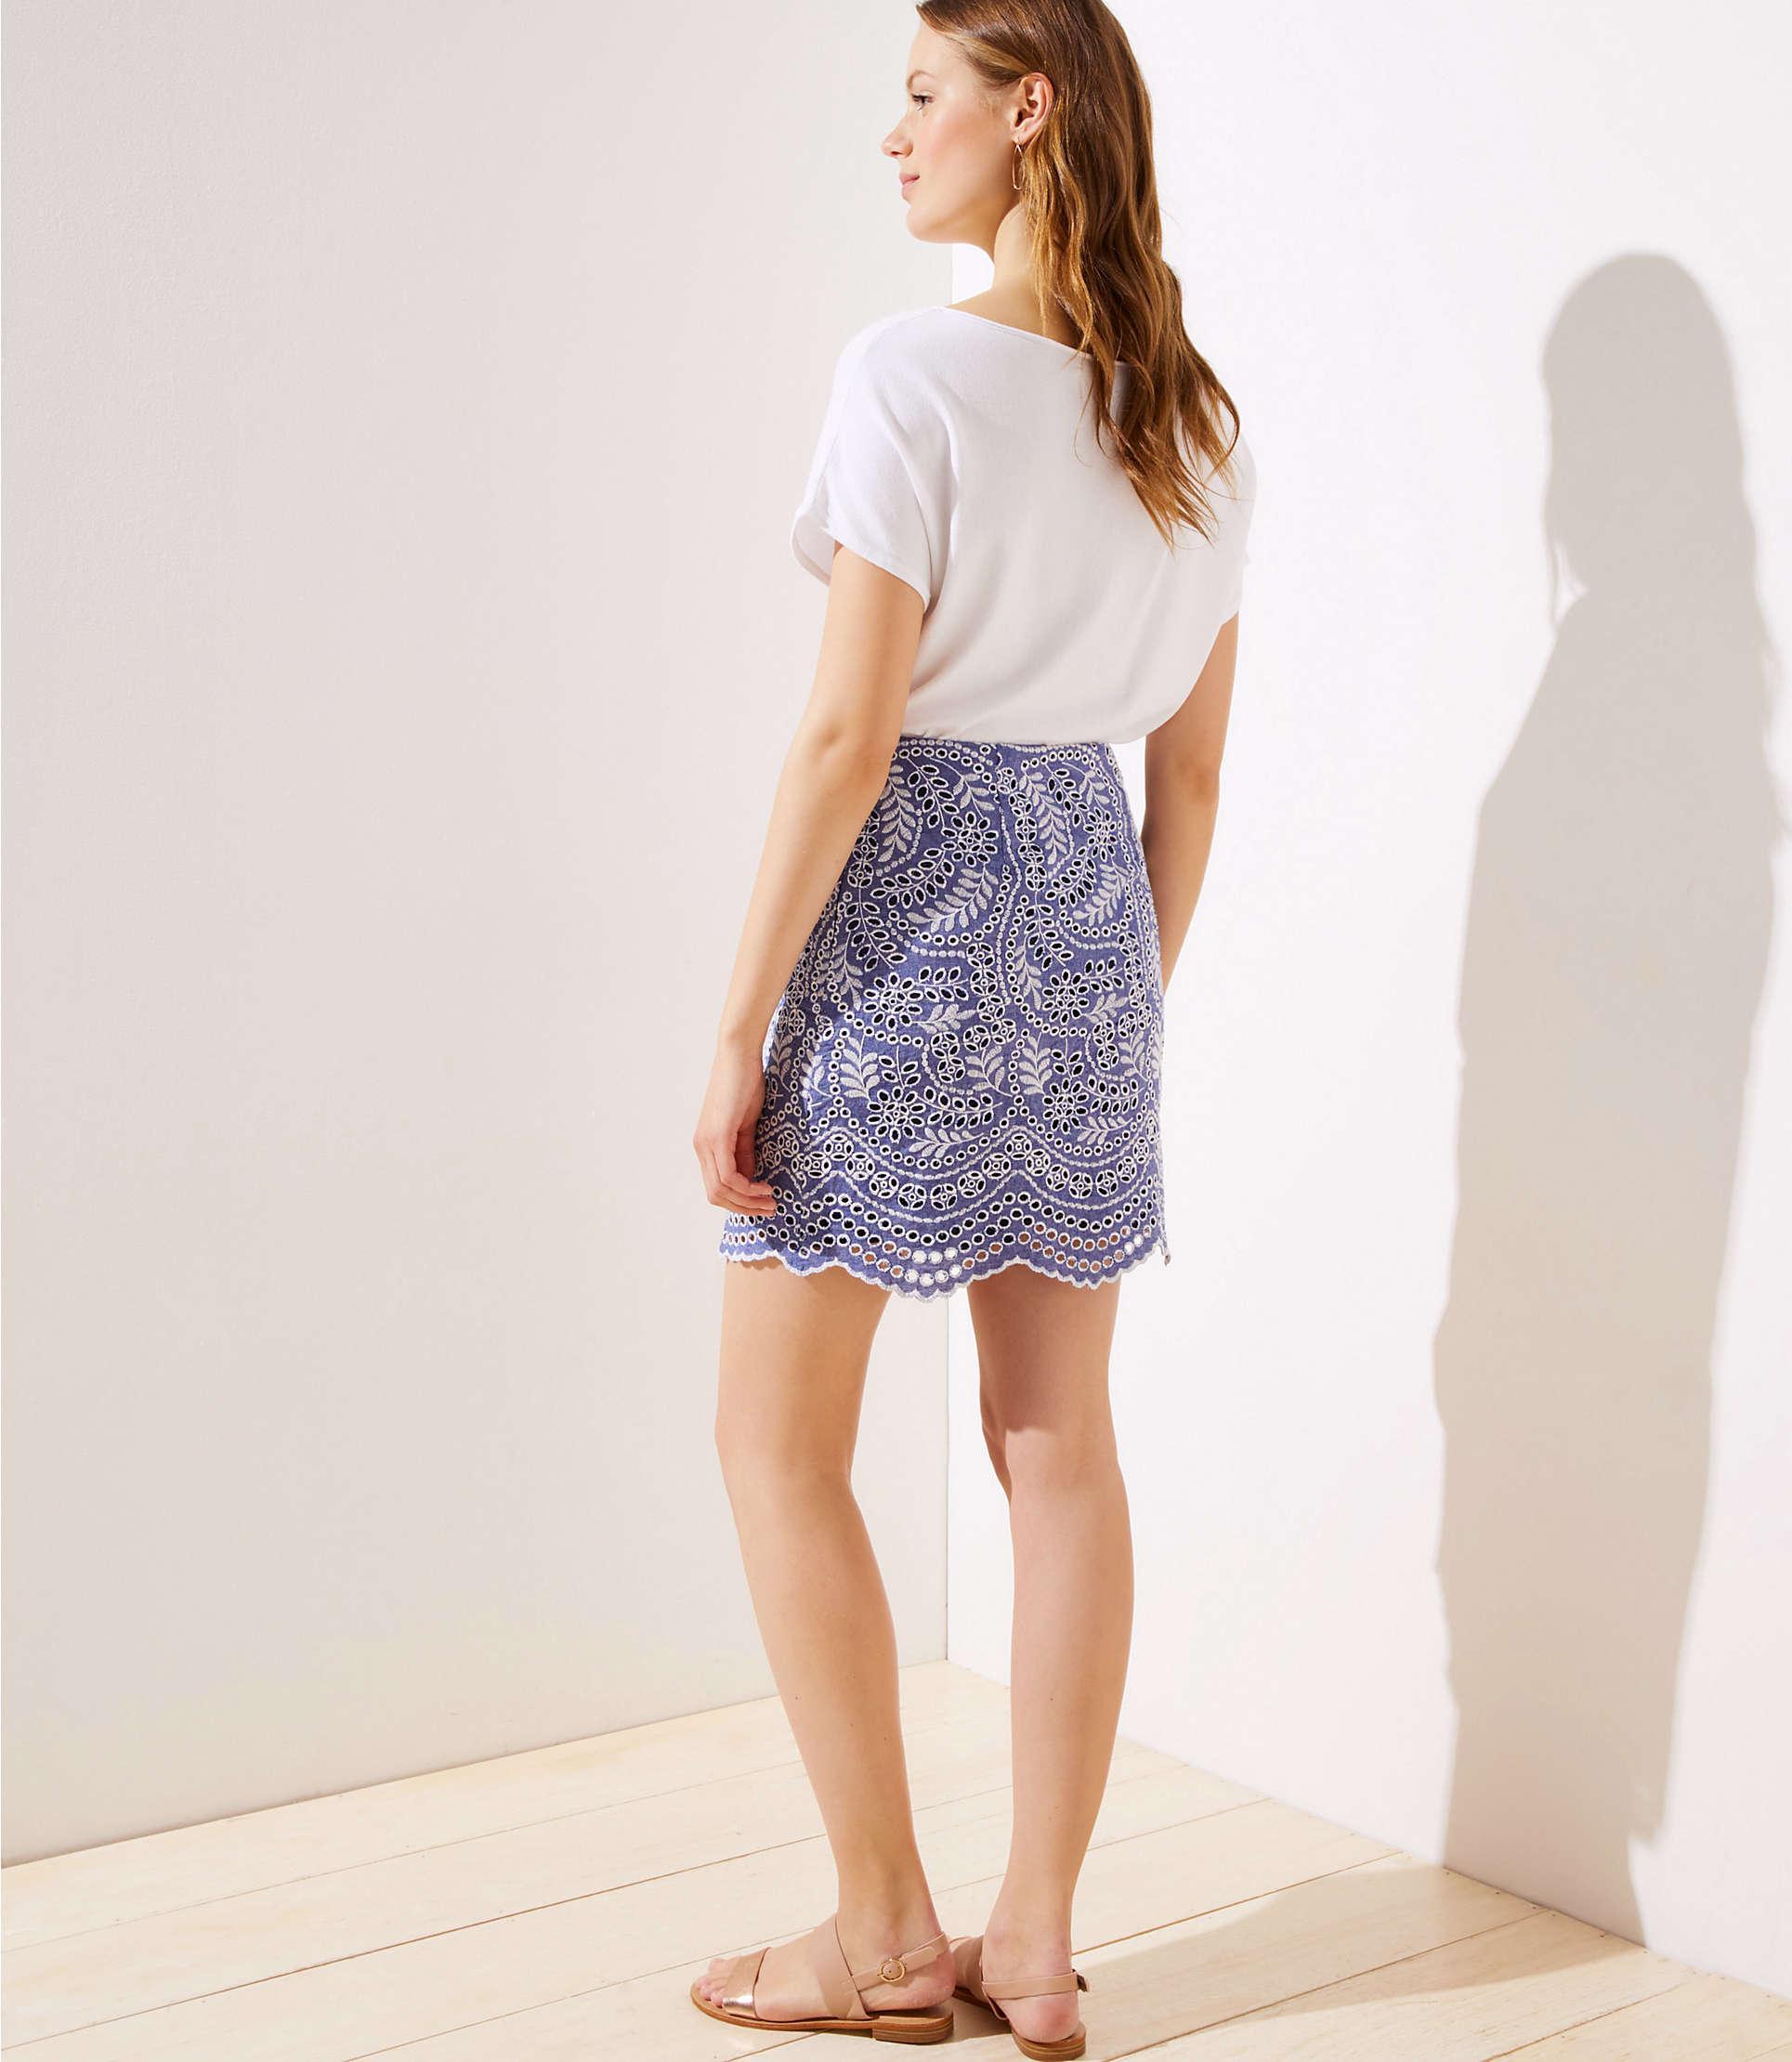 68d16184bf57 ... Scalloped Embroidered Eyelet Skirt - Lyst. View fullscreen